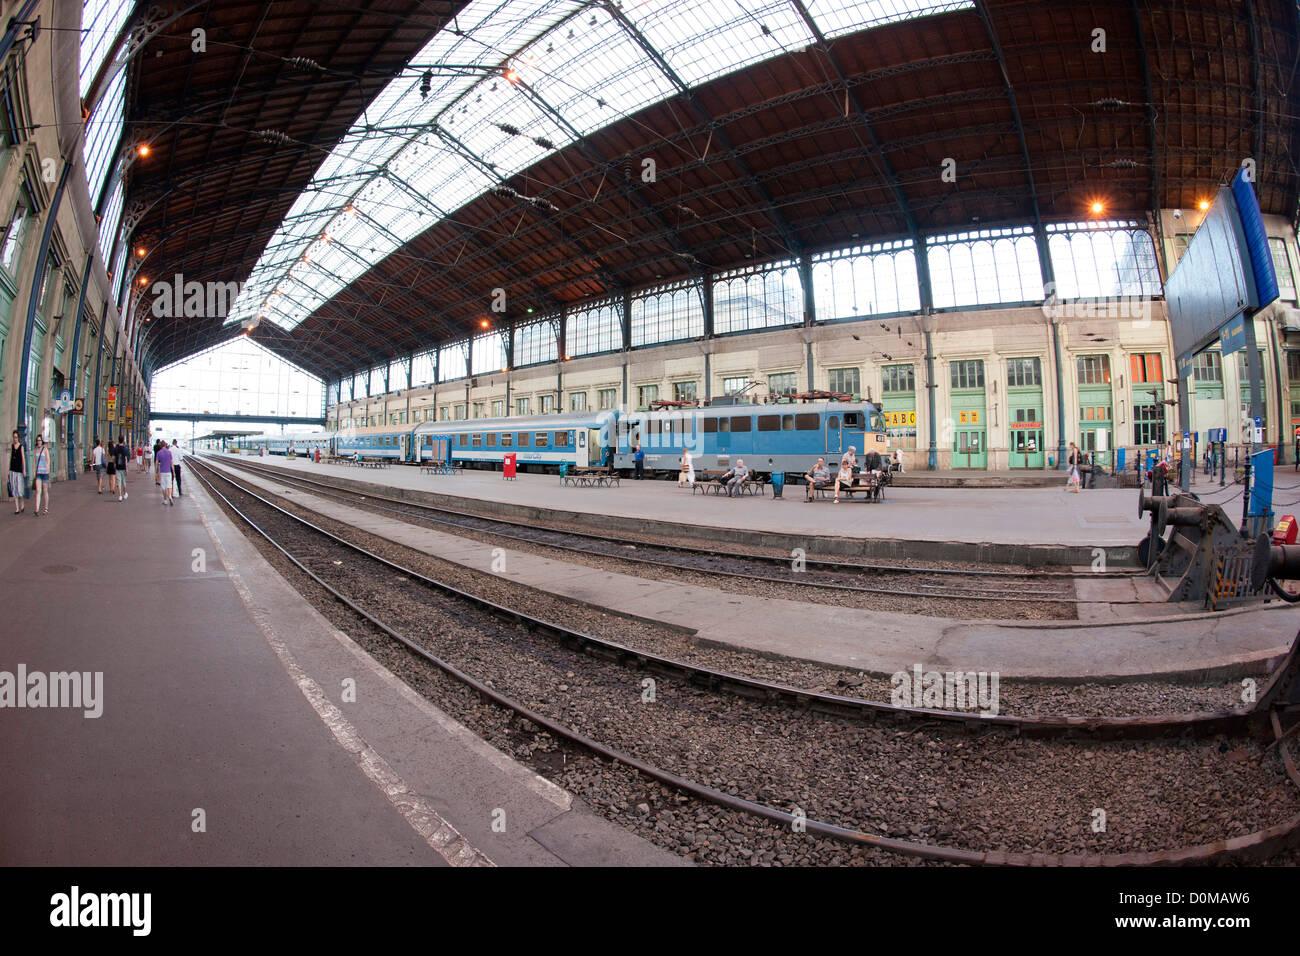 train station stockfotos train station bilder alamy. Black Bedroom Furniture Sets. Home Design Ideas